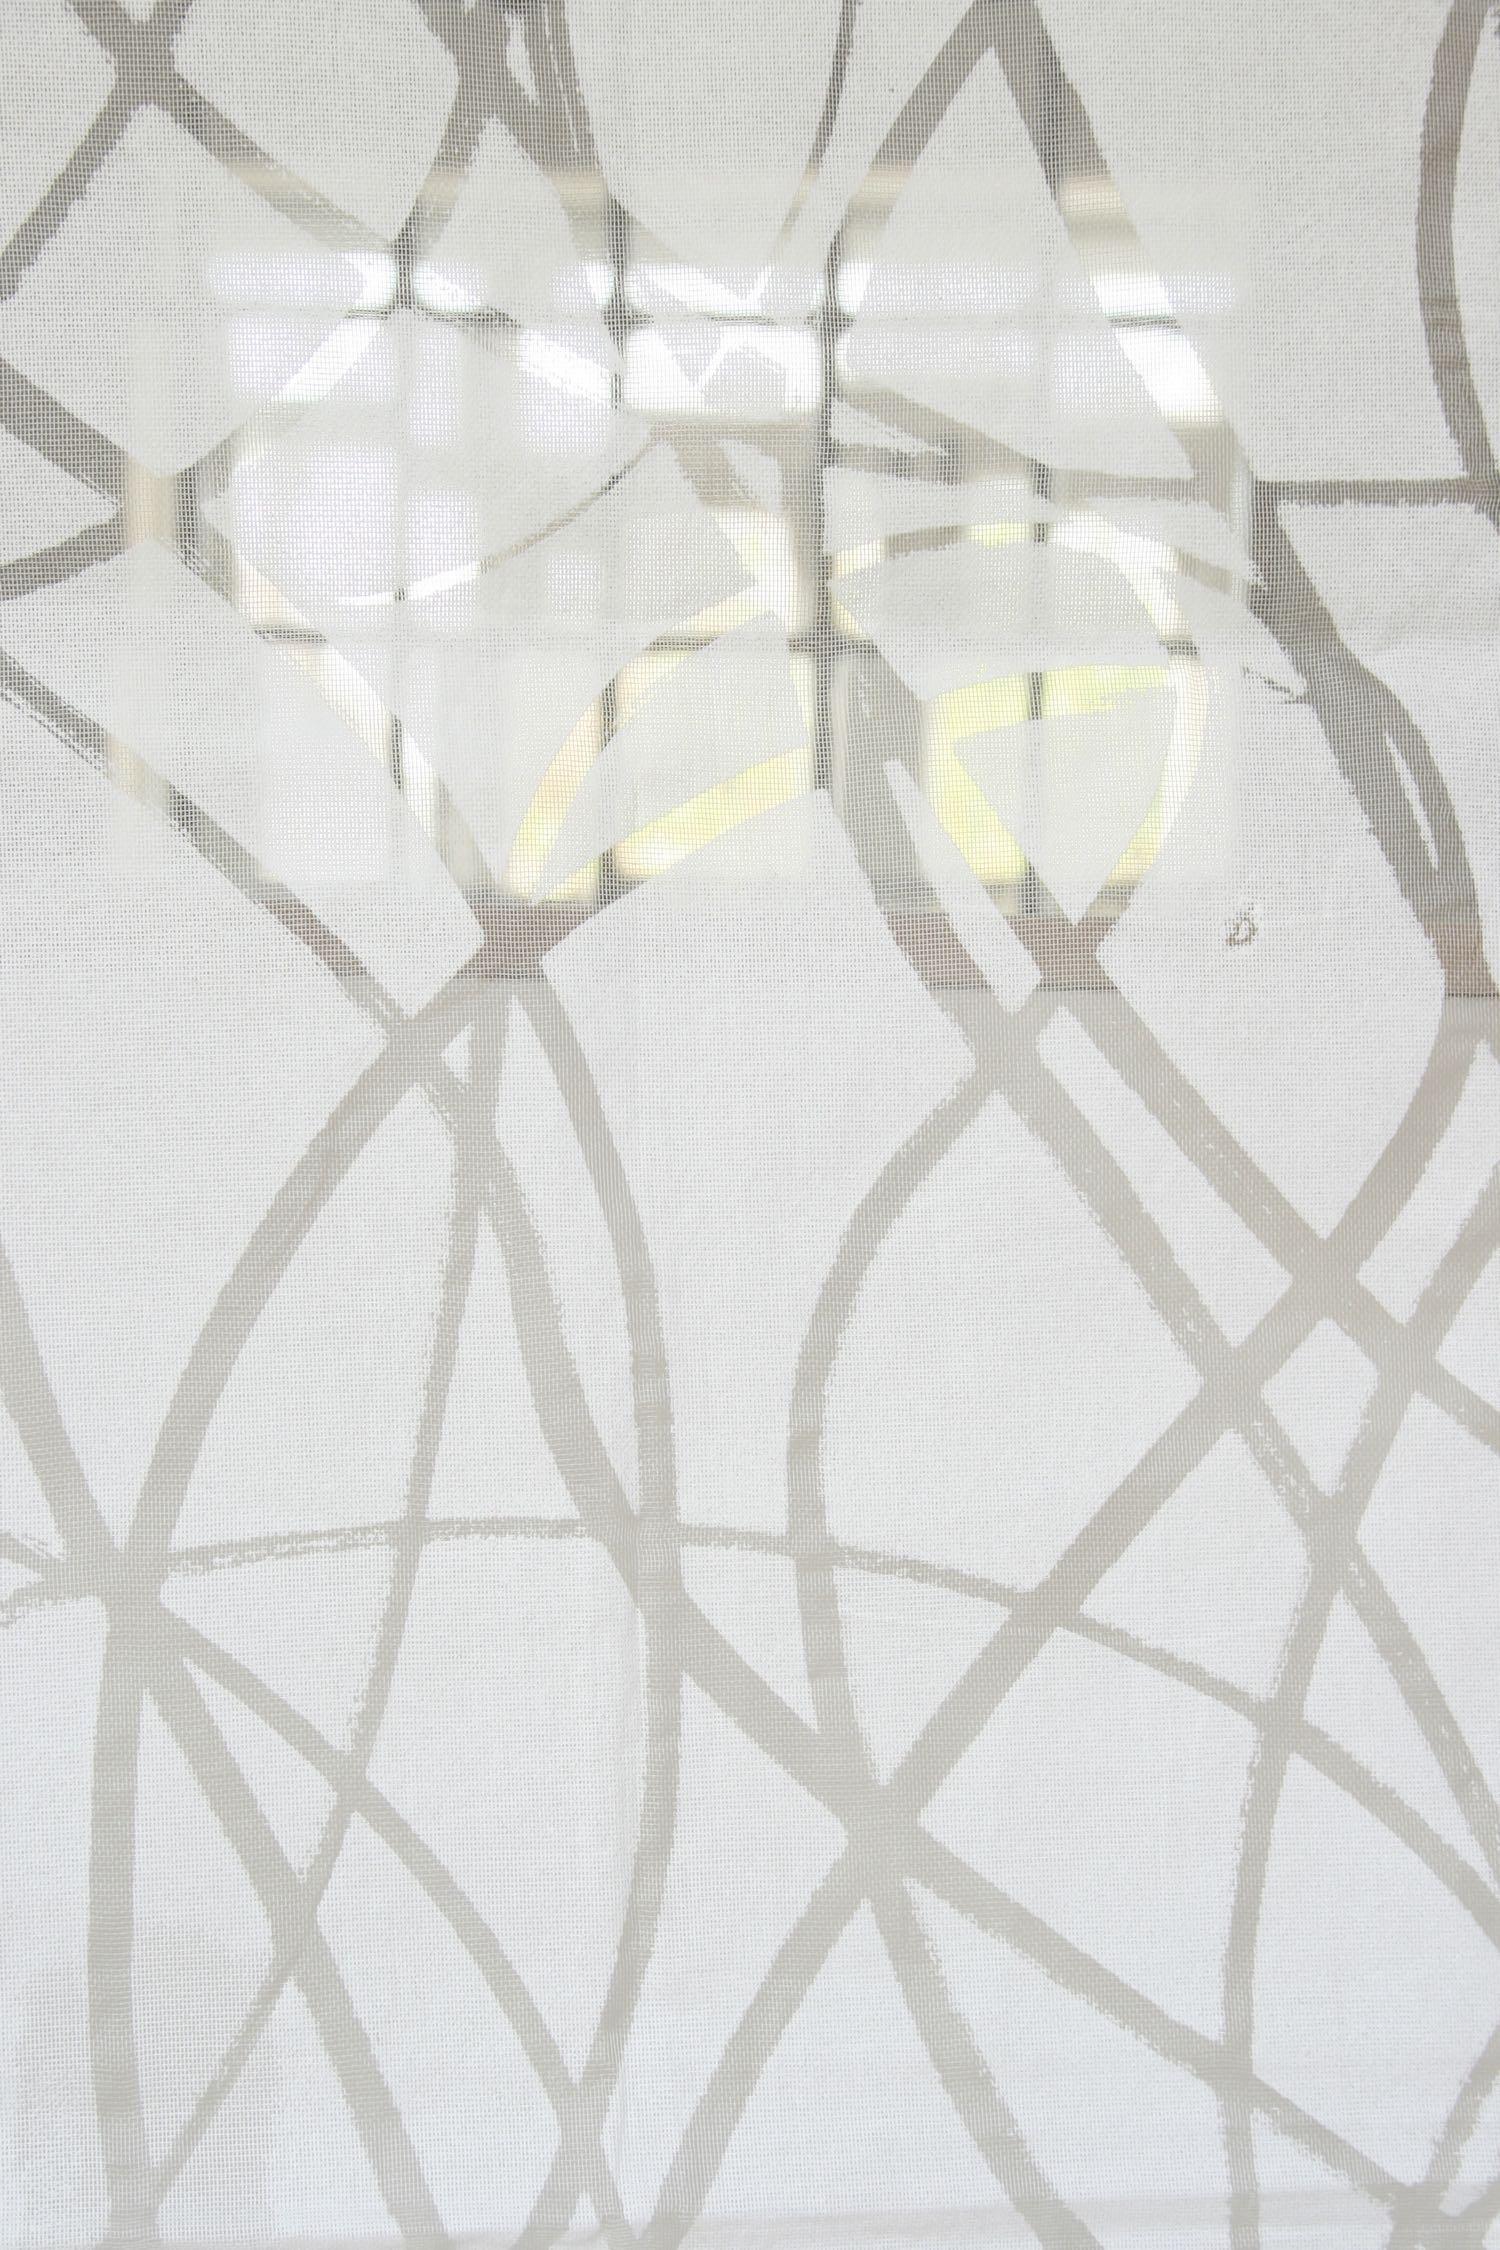 Entwine   Hand screen printed, silk gauze